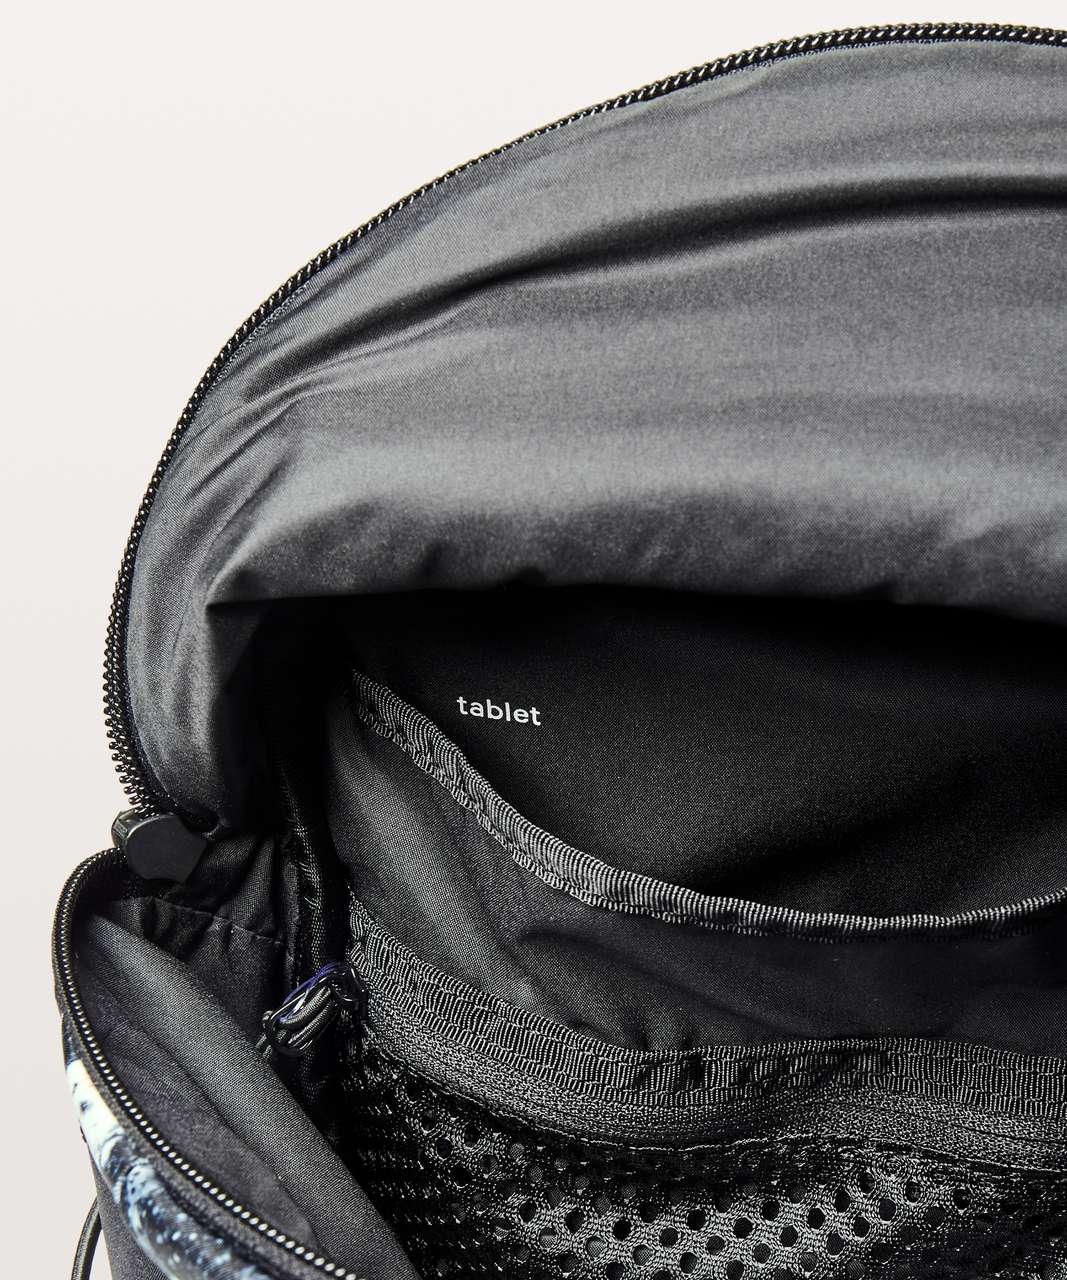 Lululemon Run All Day Backpack II *13L - Mini Spring Bloom Multi Black / Black